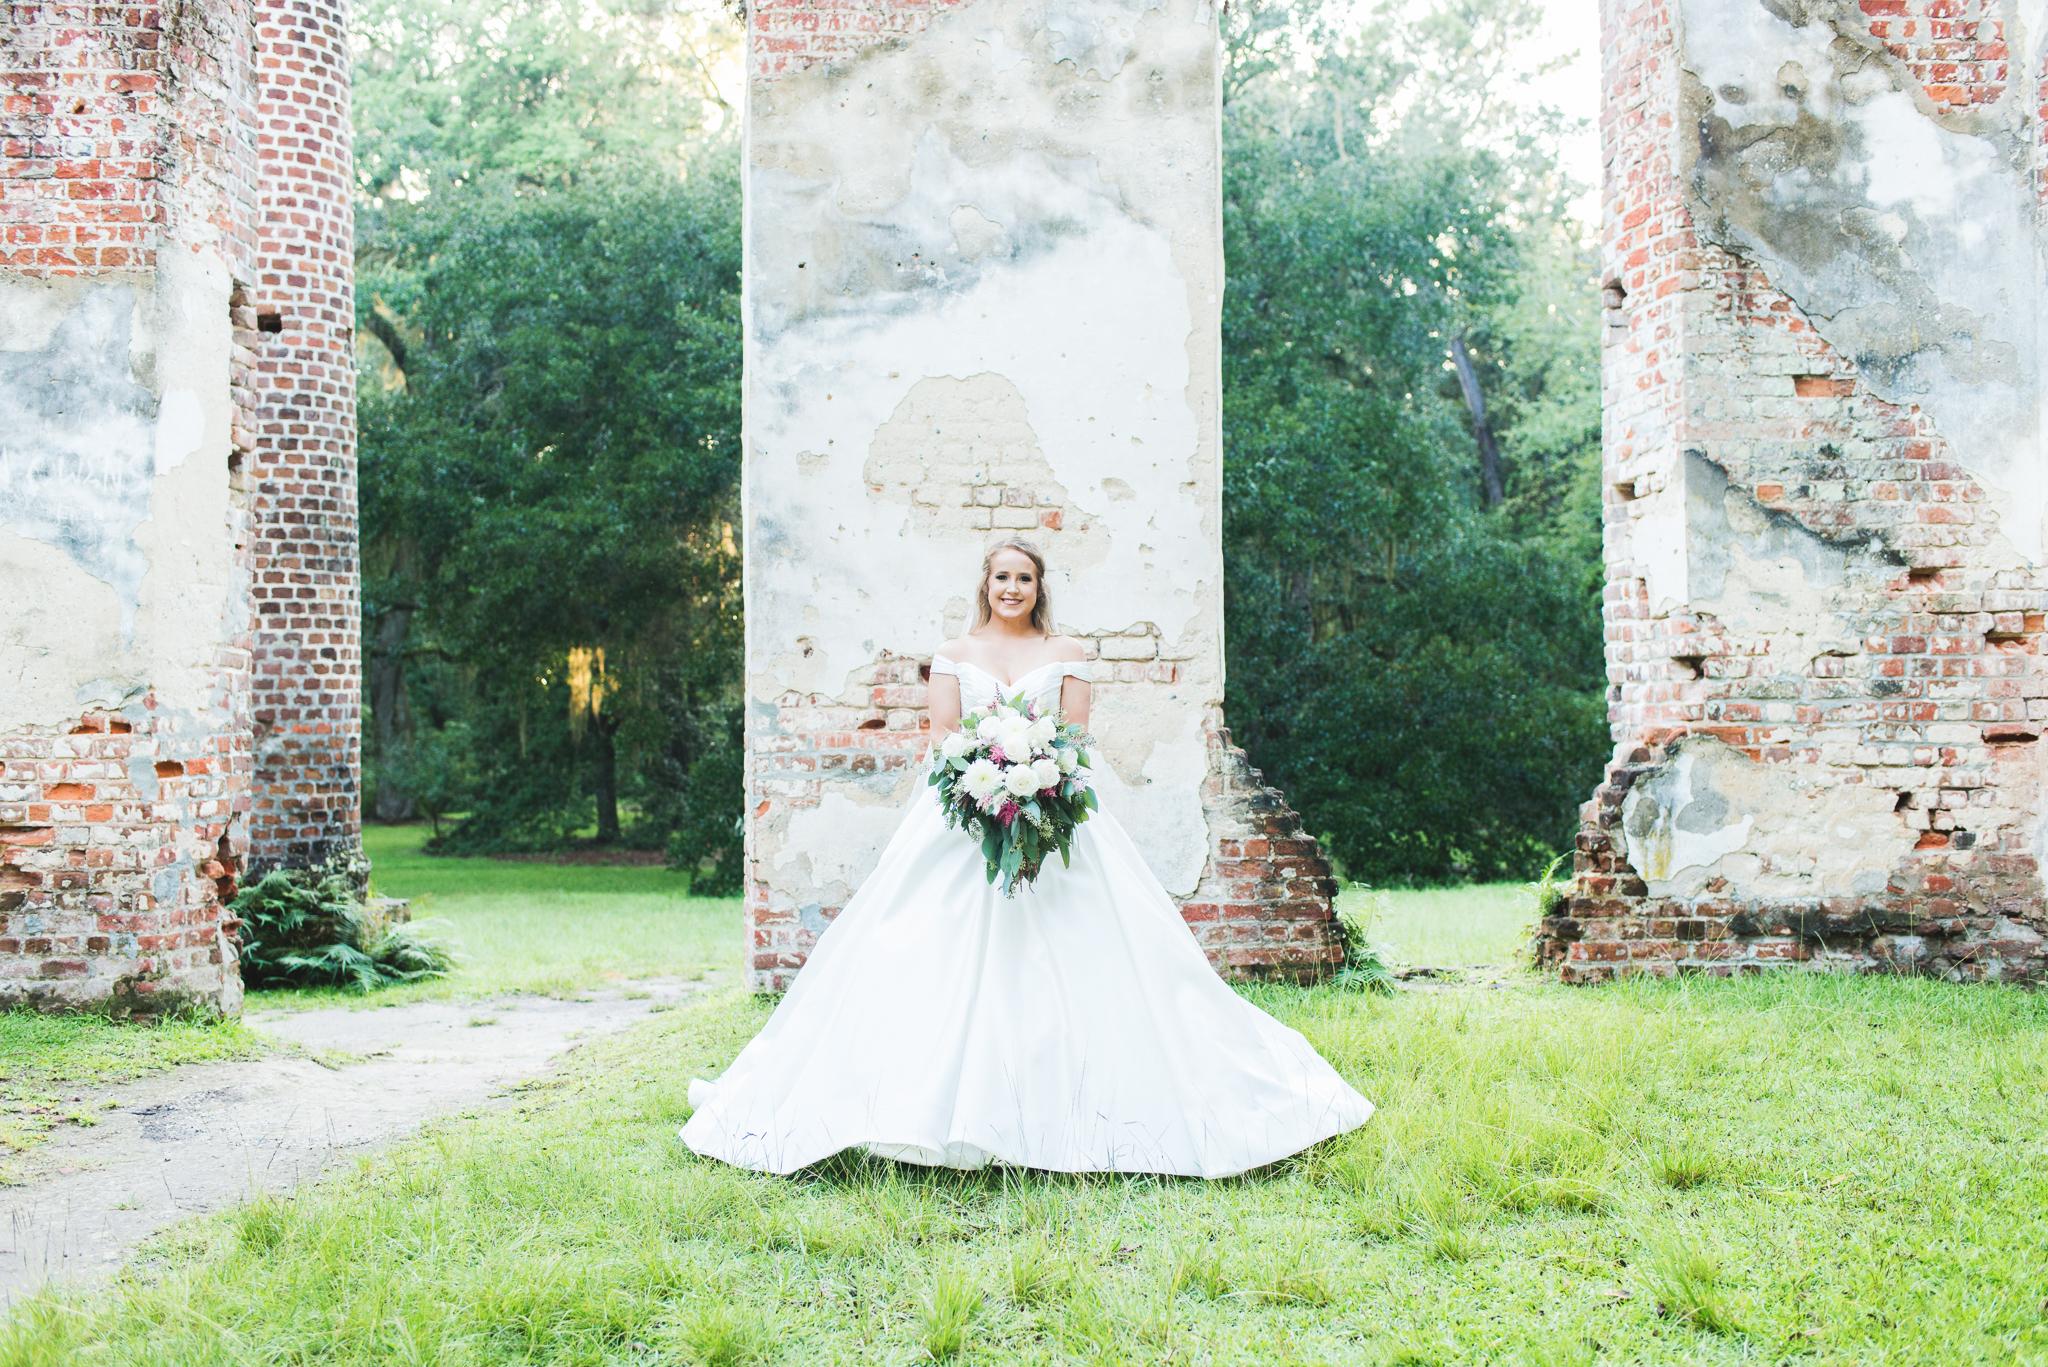 Bridals_AmberRay_blog-2.jpg